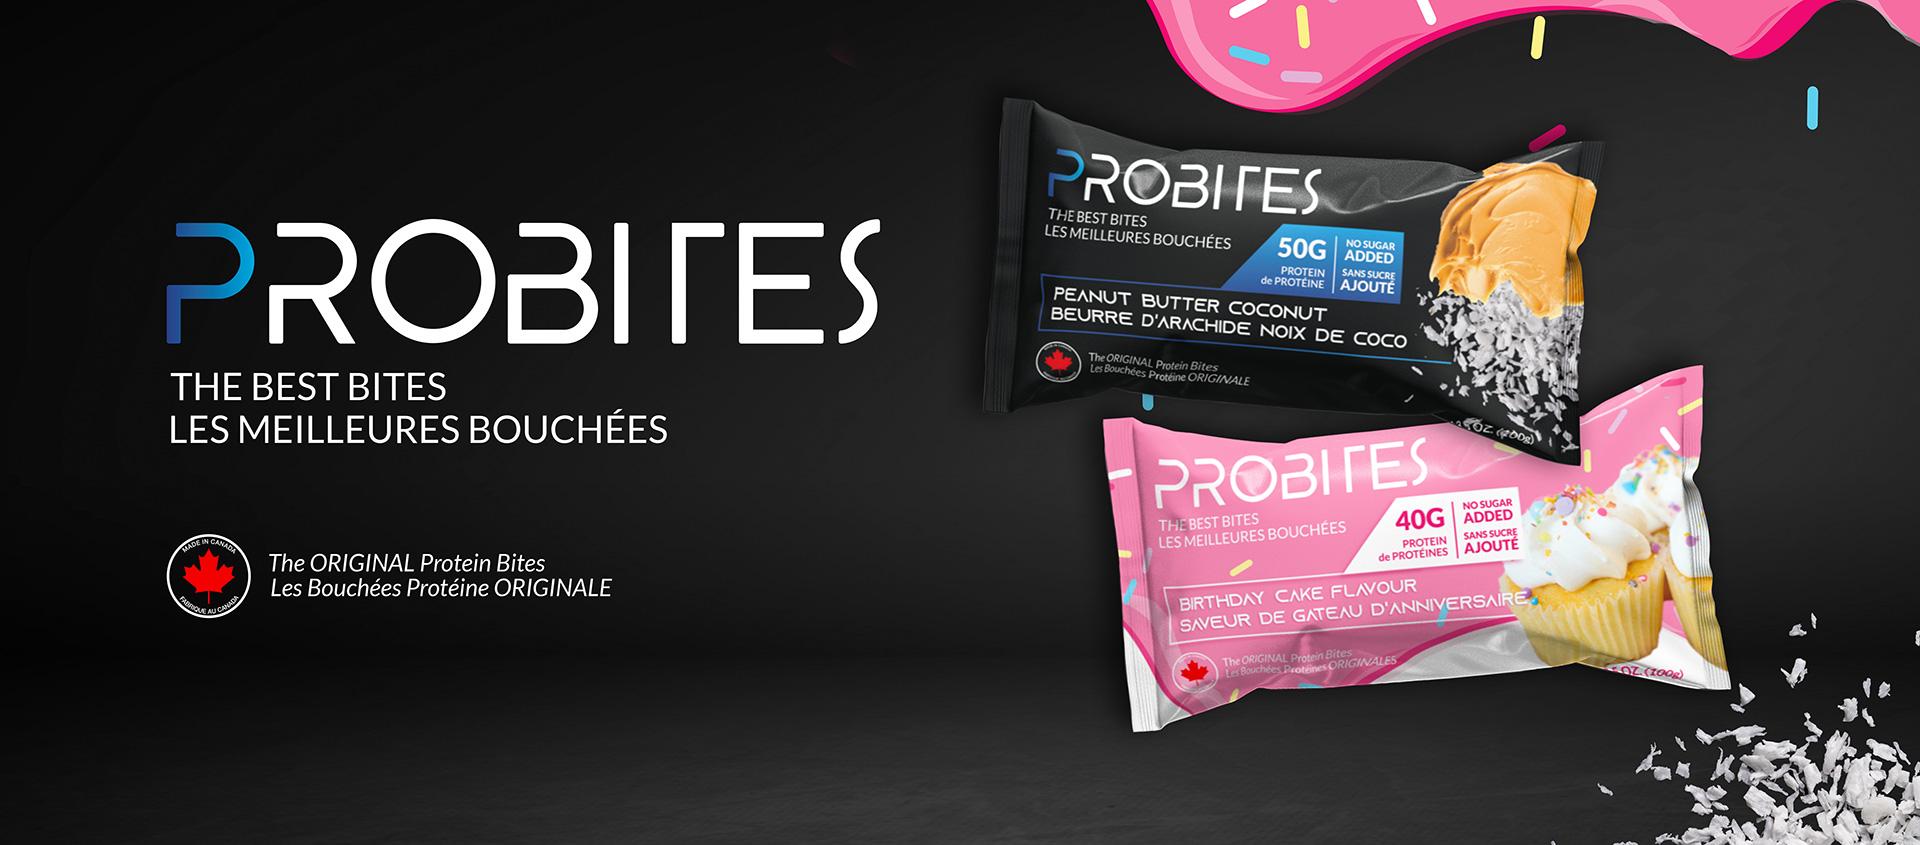 probites-banner-02